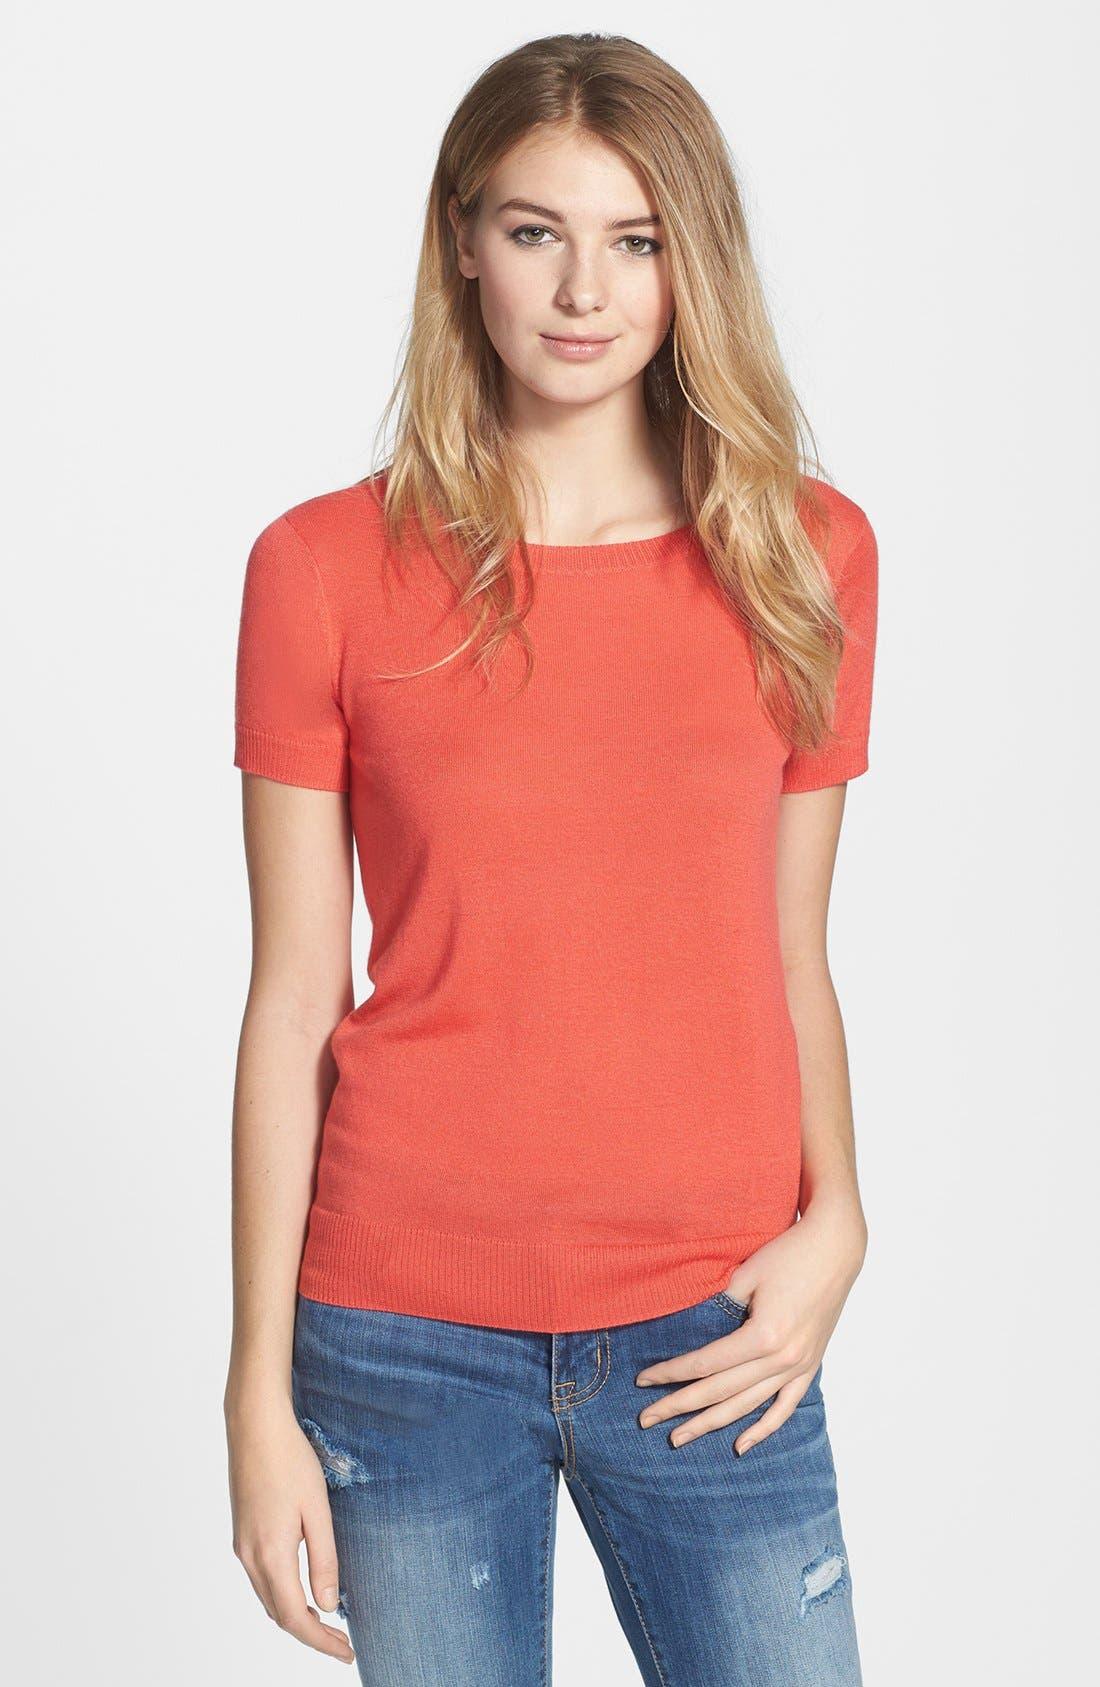 Alternate Image 1 Selected - Halogen® Fine Weight Cashmere Sweater (Regular & Petite)